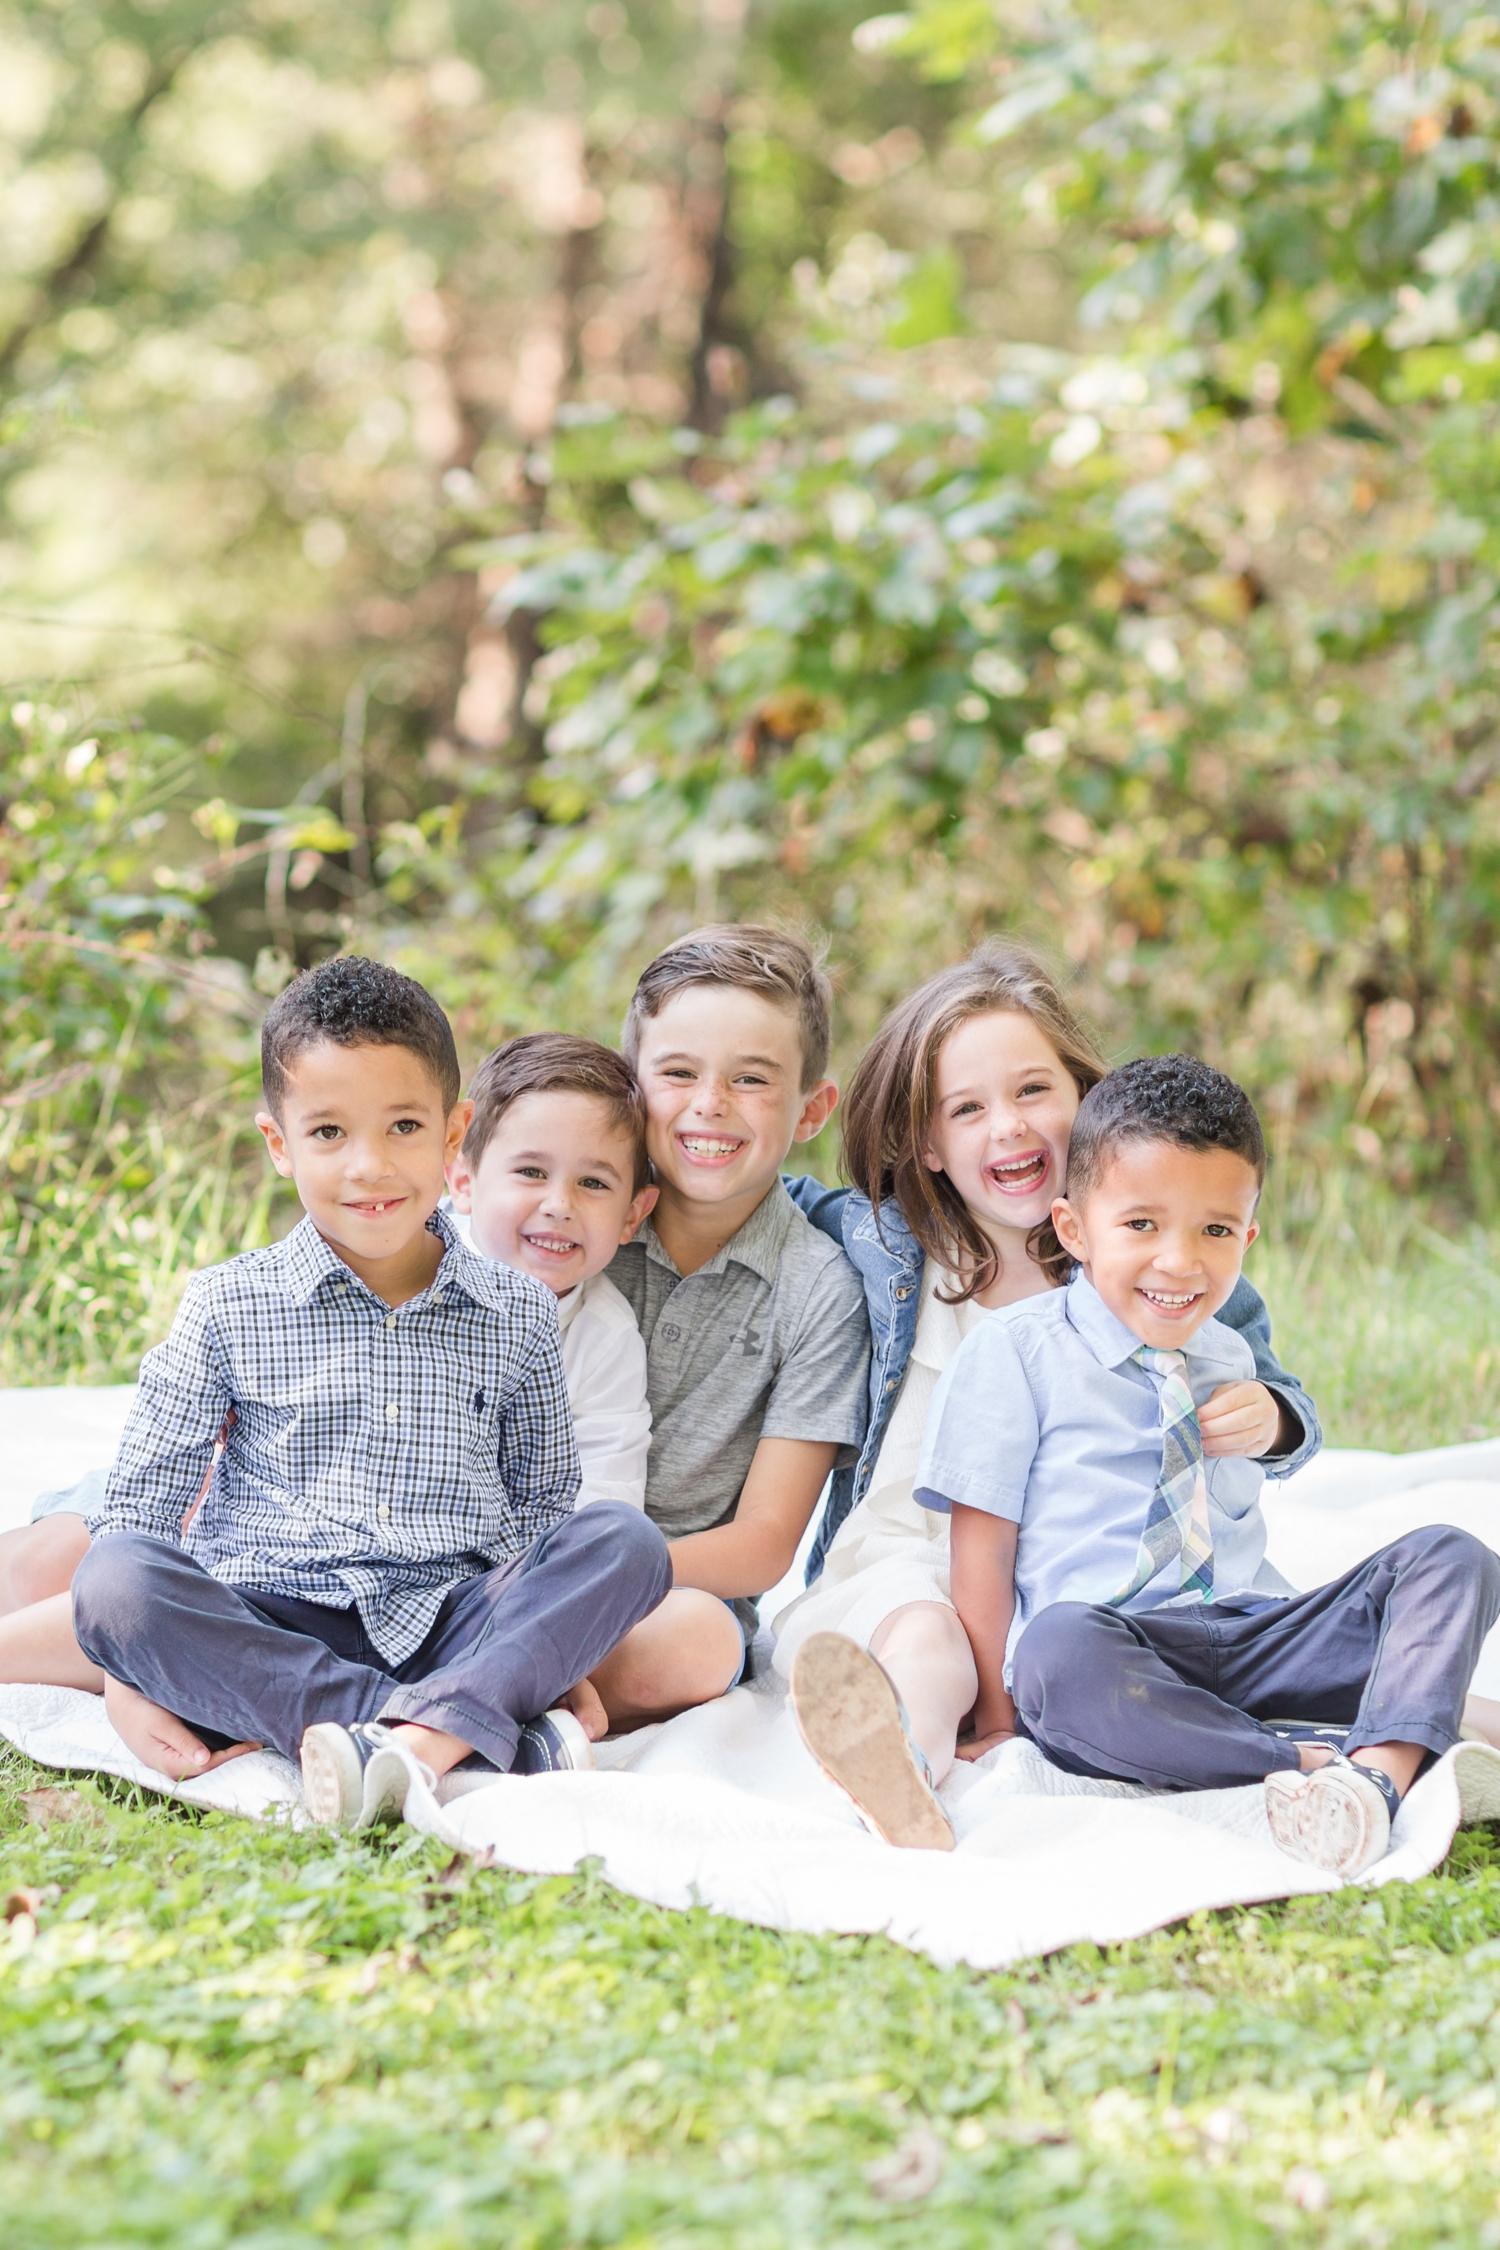 Smith-Padgett Family 2018-21_Jerusalem-Mill-Maryland-Family-Photographer-anna-grace-photography-photo.jpg